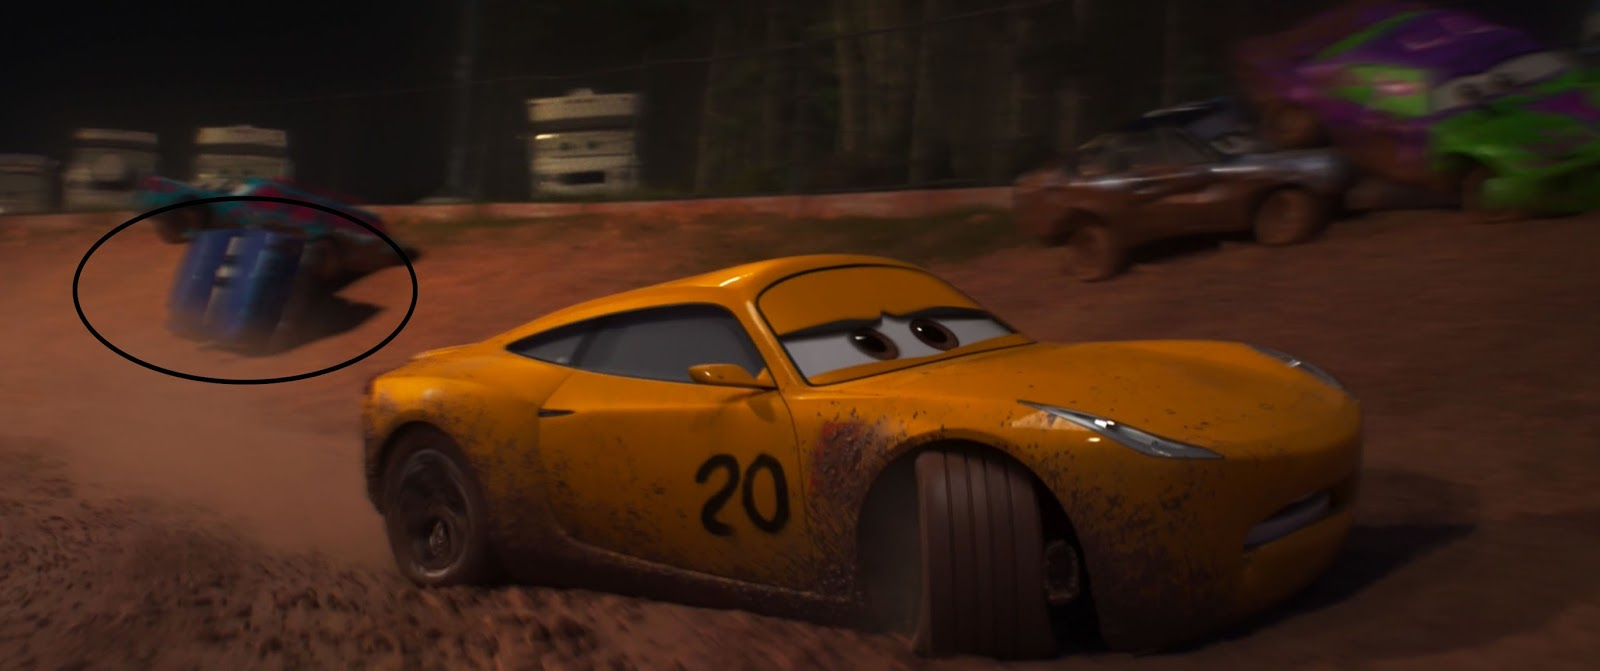 pixar cars 3 broadside mattel diecast